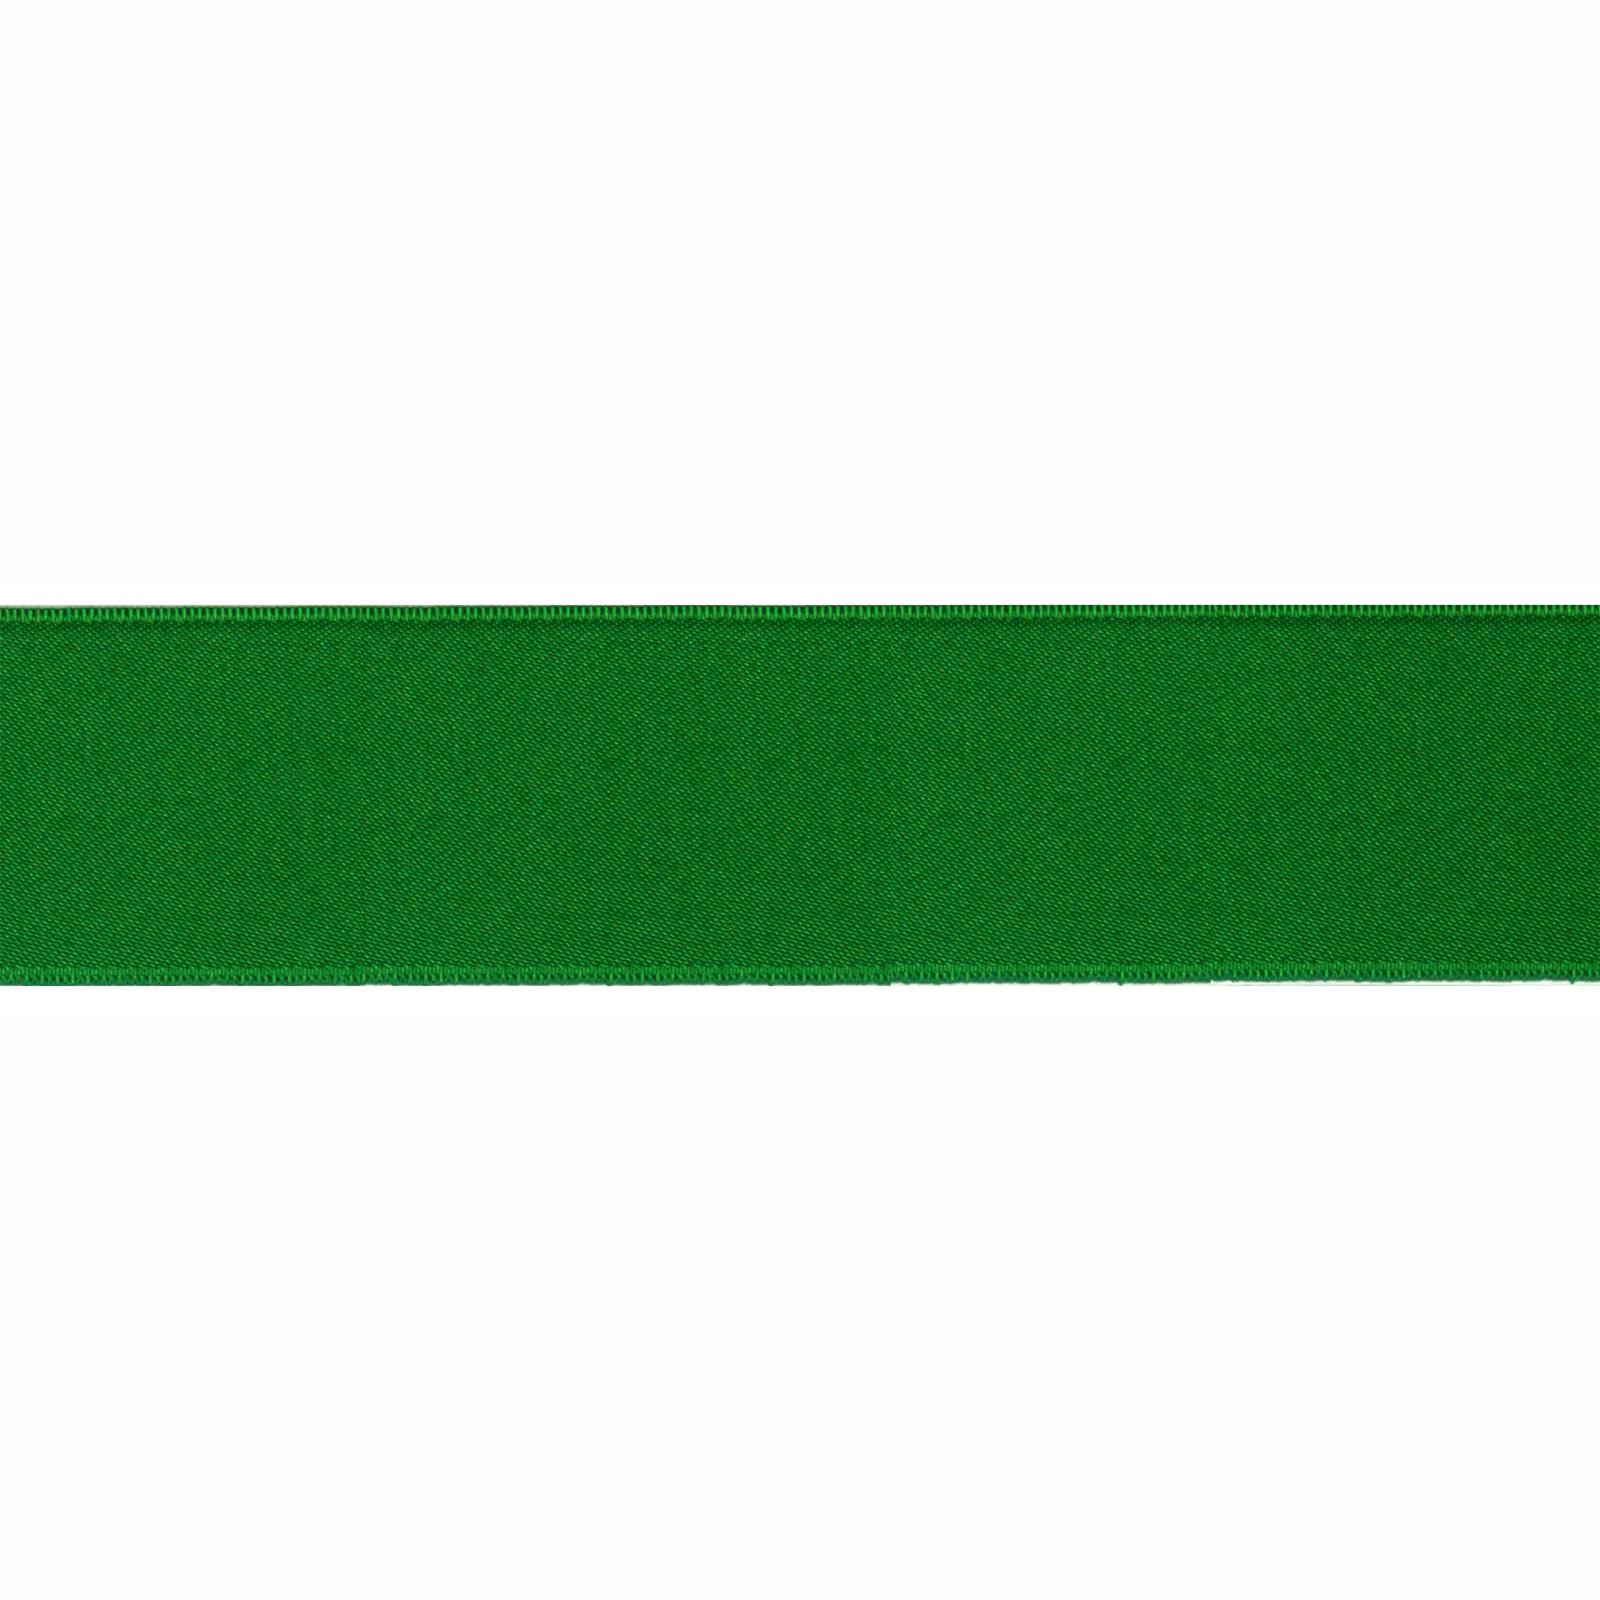 REStyle Satijnlint Biljart Groen-495